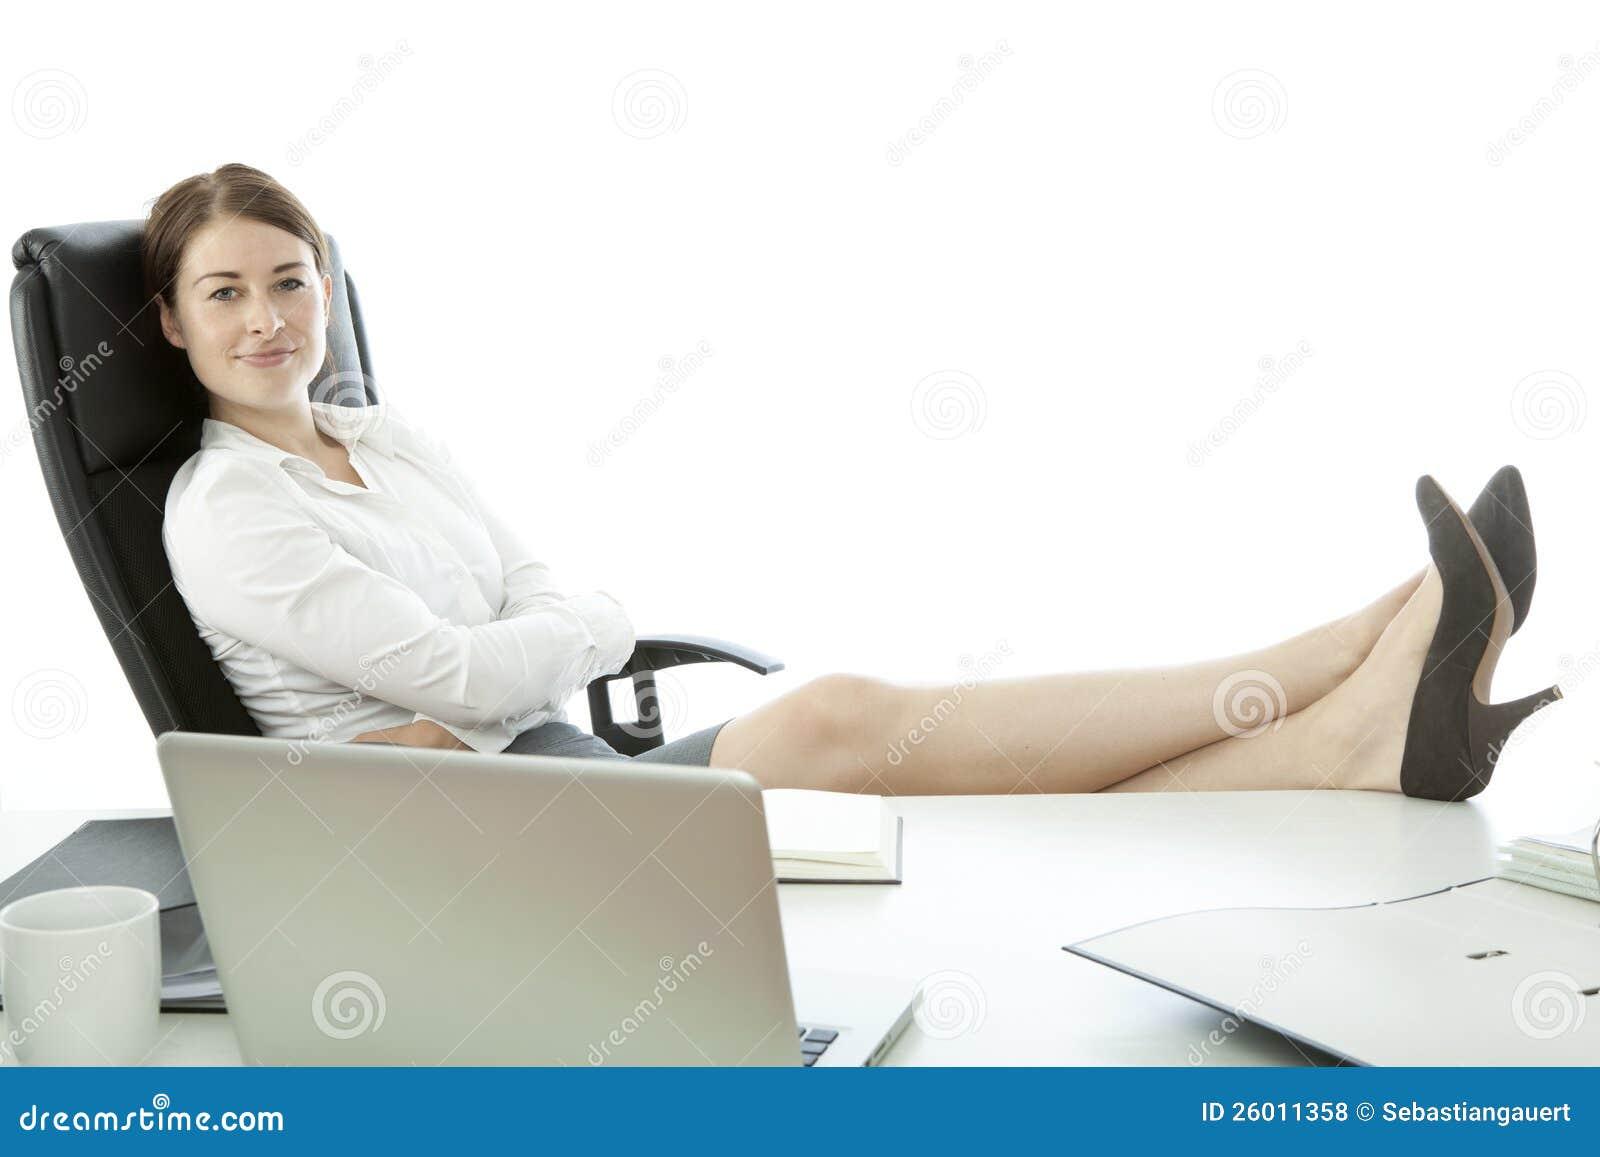 Clipart Girl At Desk